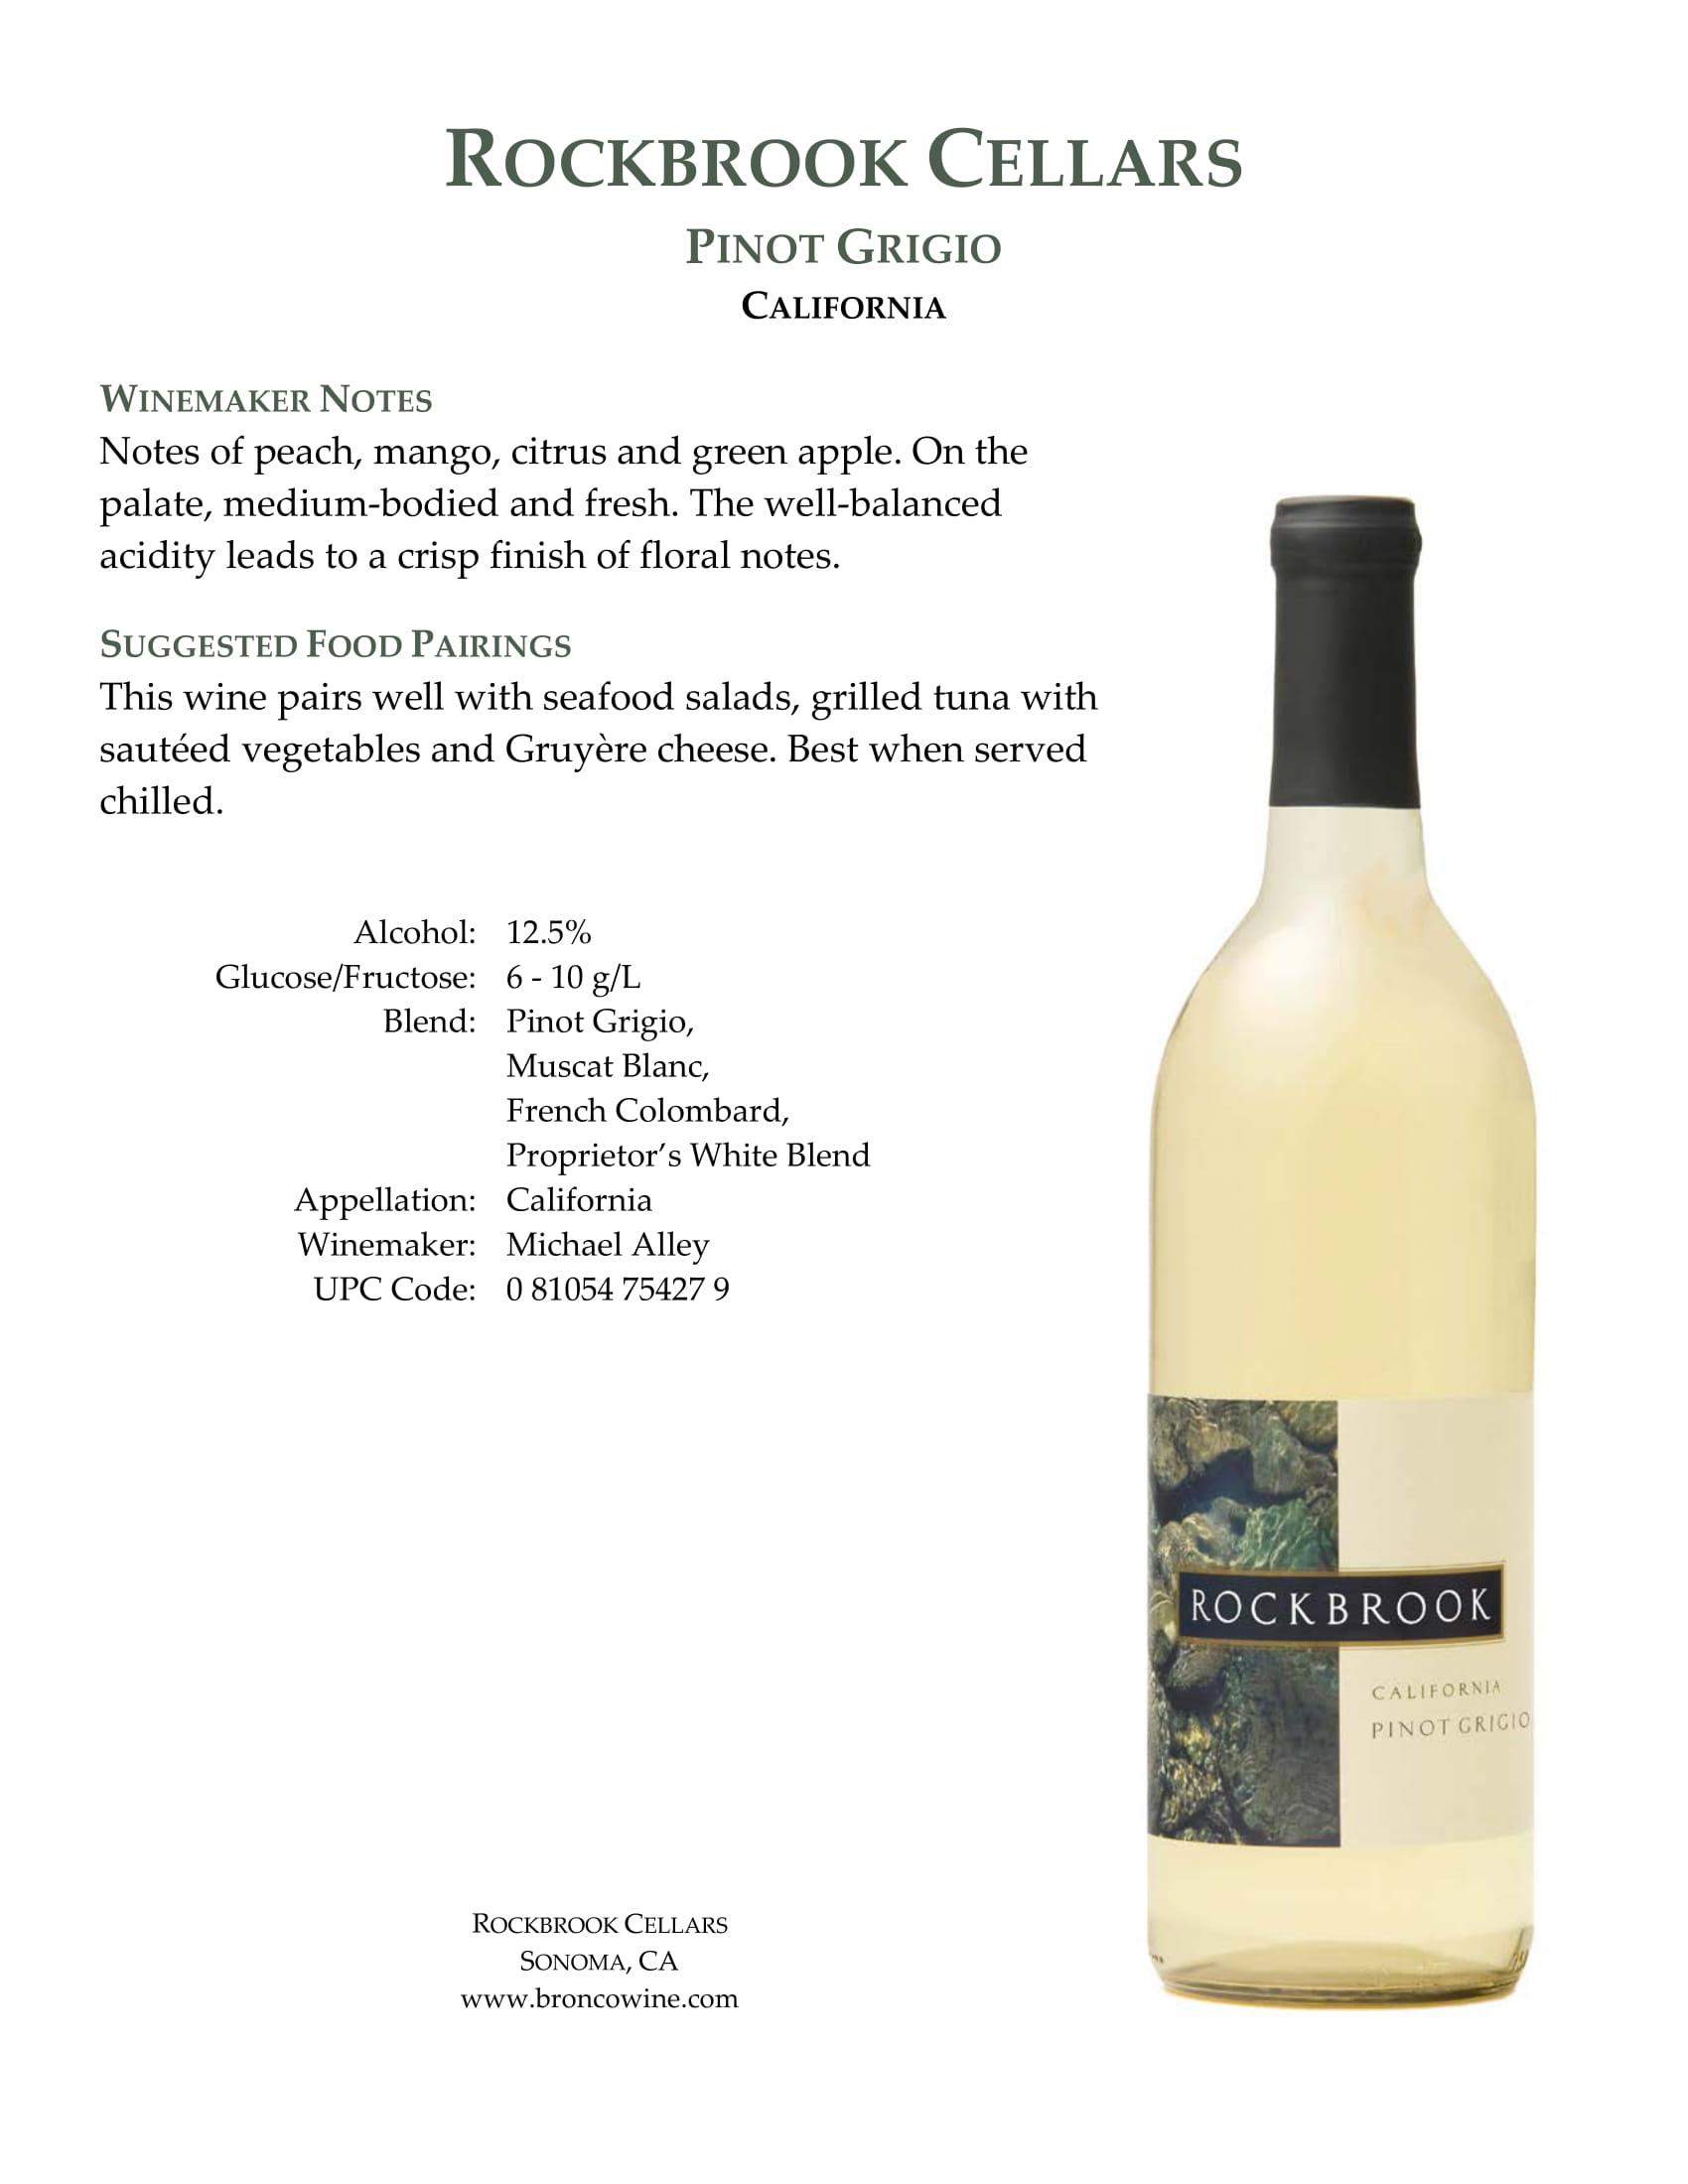 Rockbrook Cellars Pinot Grigio Tech Sheet